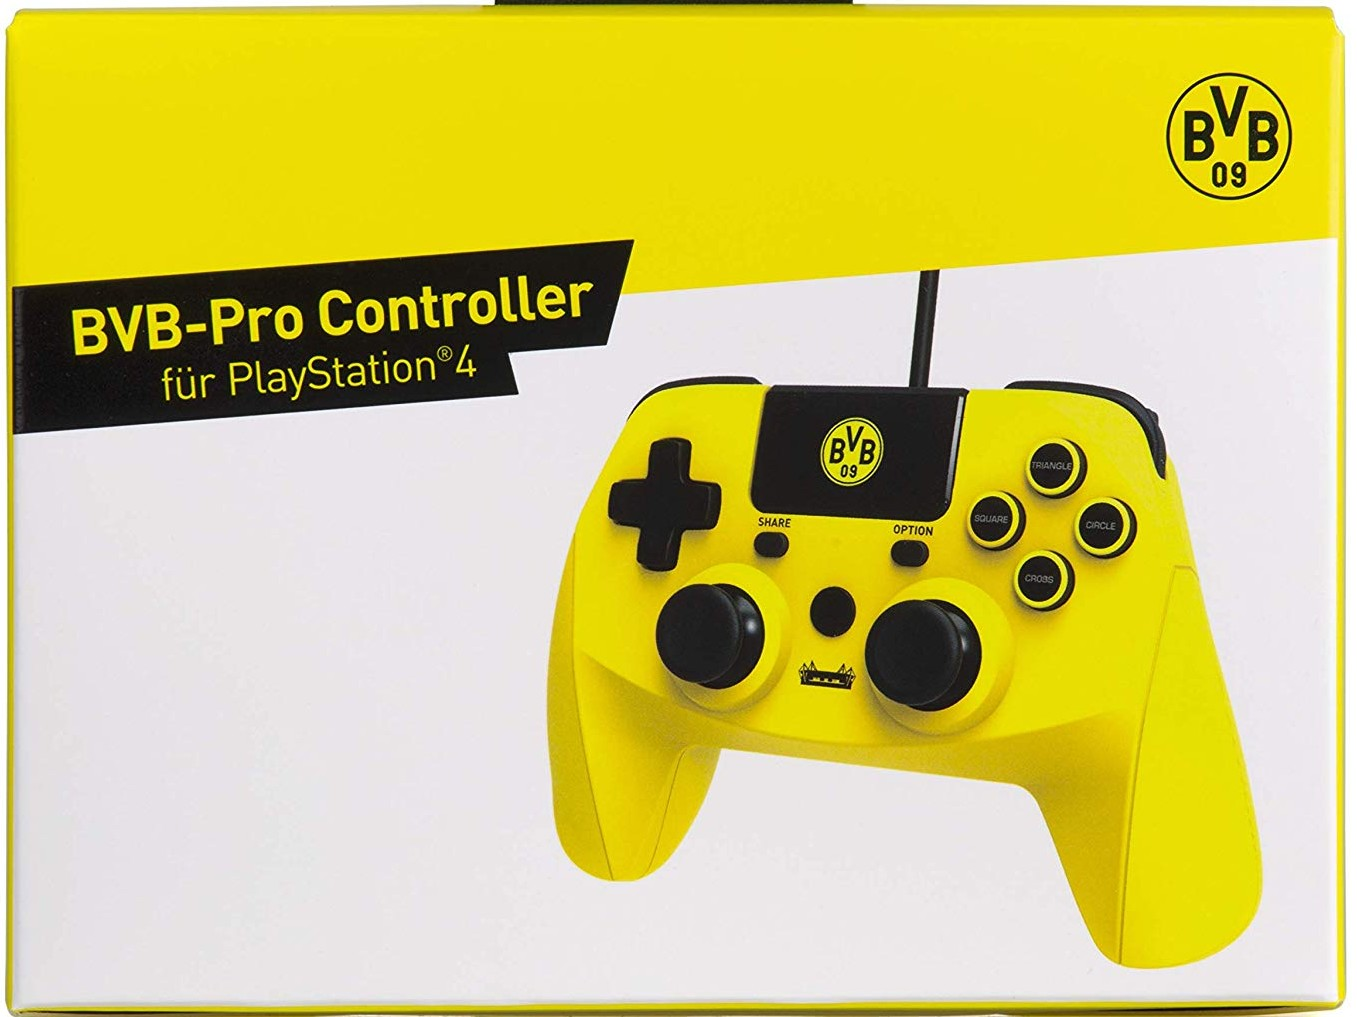 snakebyte bvb-pro controller für playstation 4, kabelgebunden